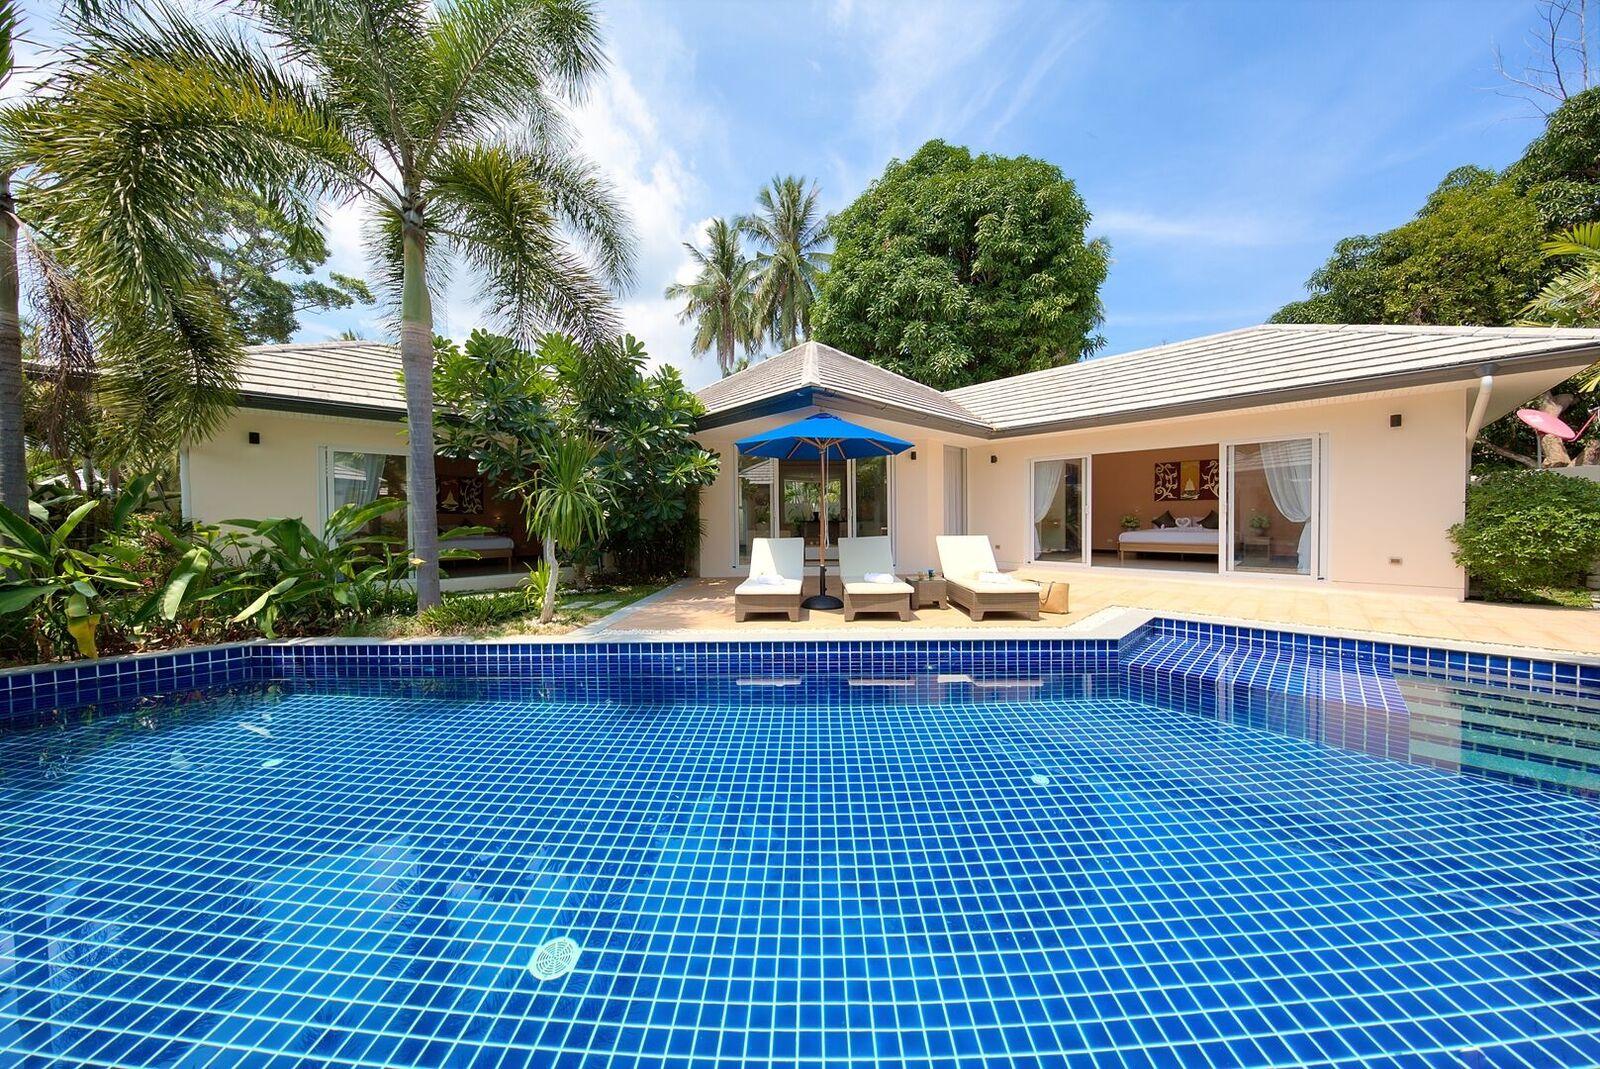 2 Bedroom Garden View Villa with Private Pool at Lipa Noi Koh Samui